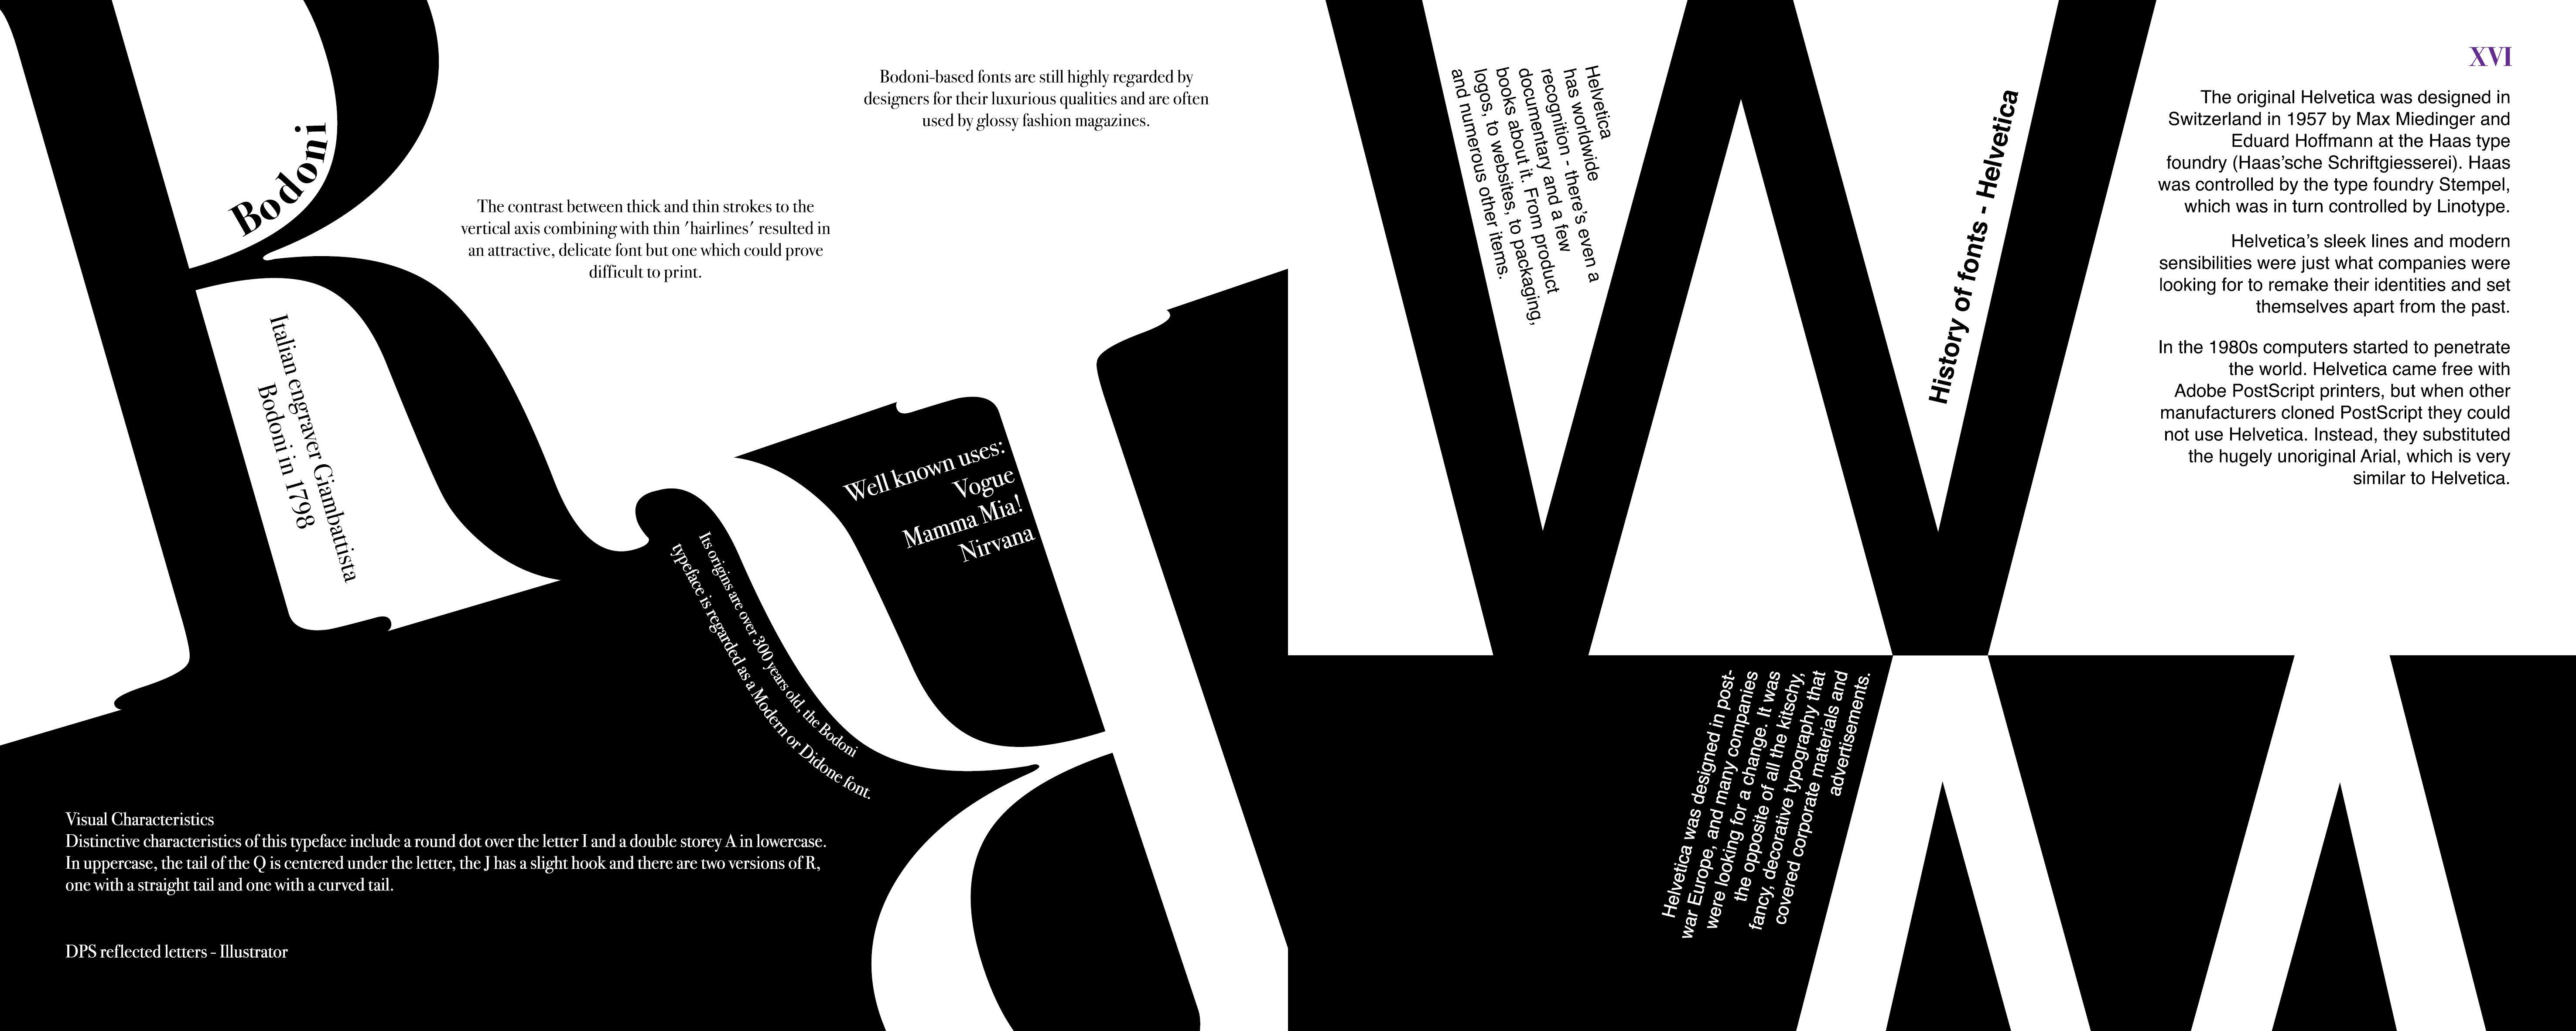 Bodoni & Helvetica - font histories   Curative brand moodboard